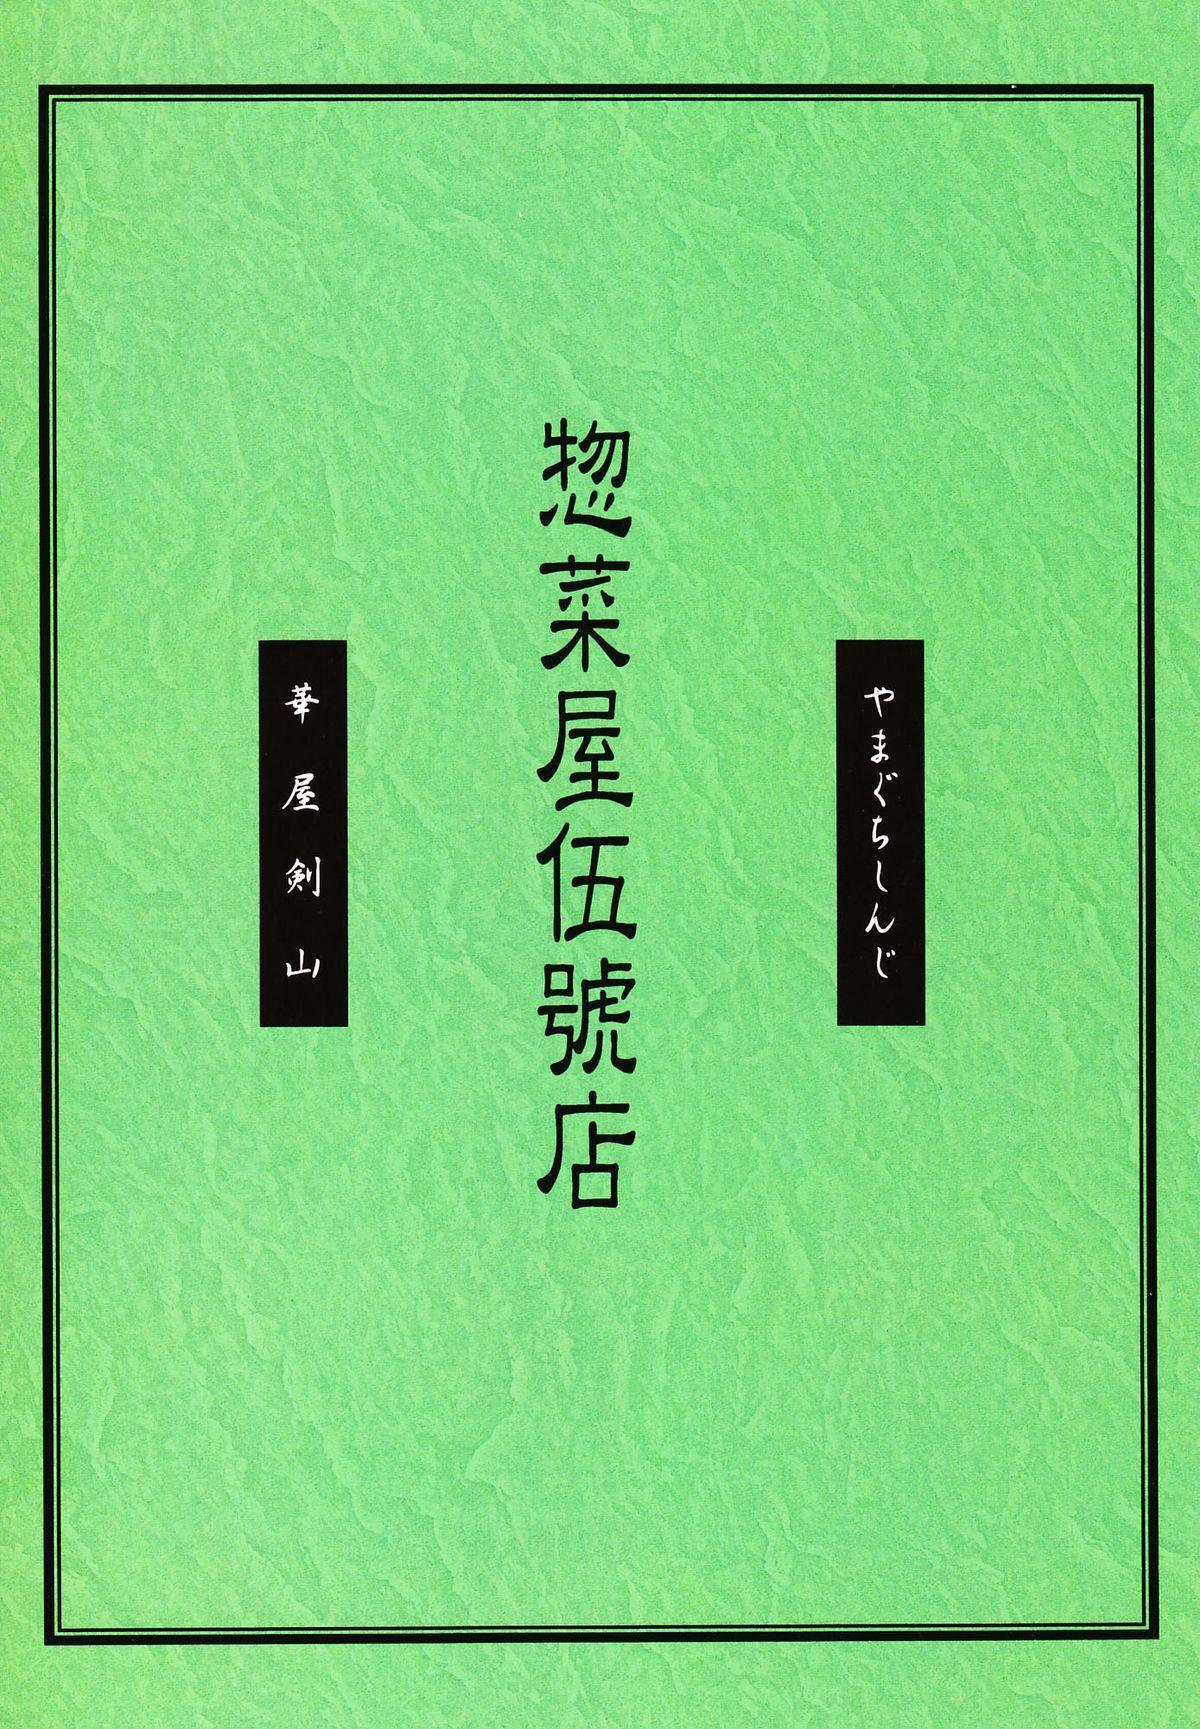 Souzaiya Go-gouten 1